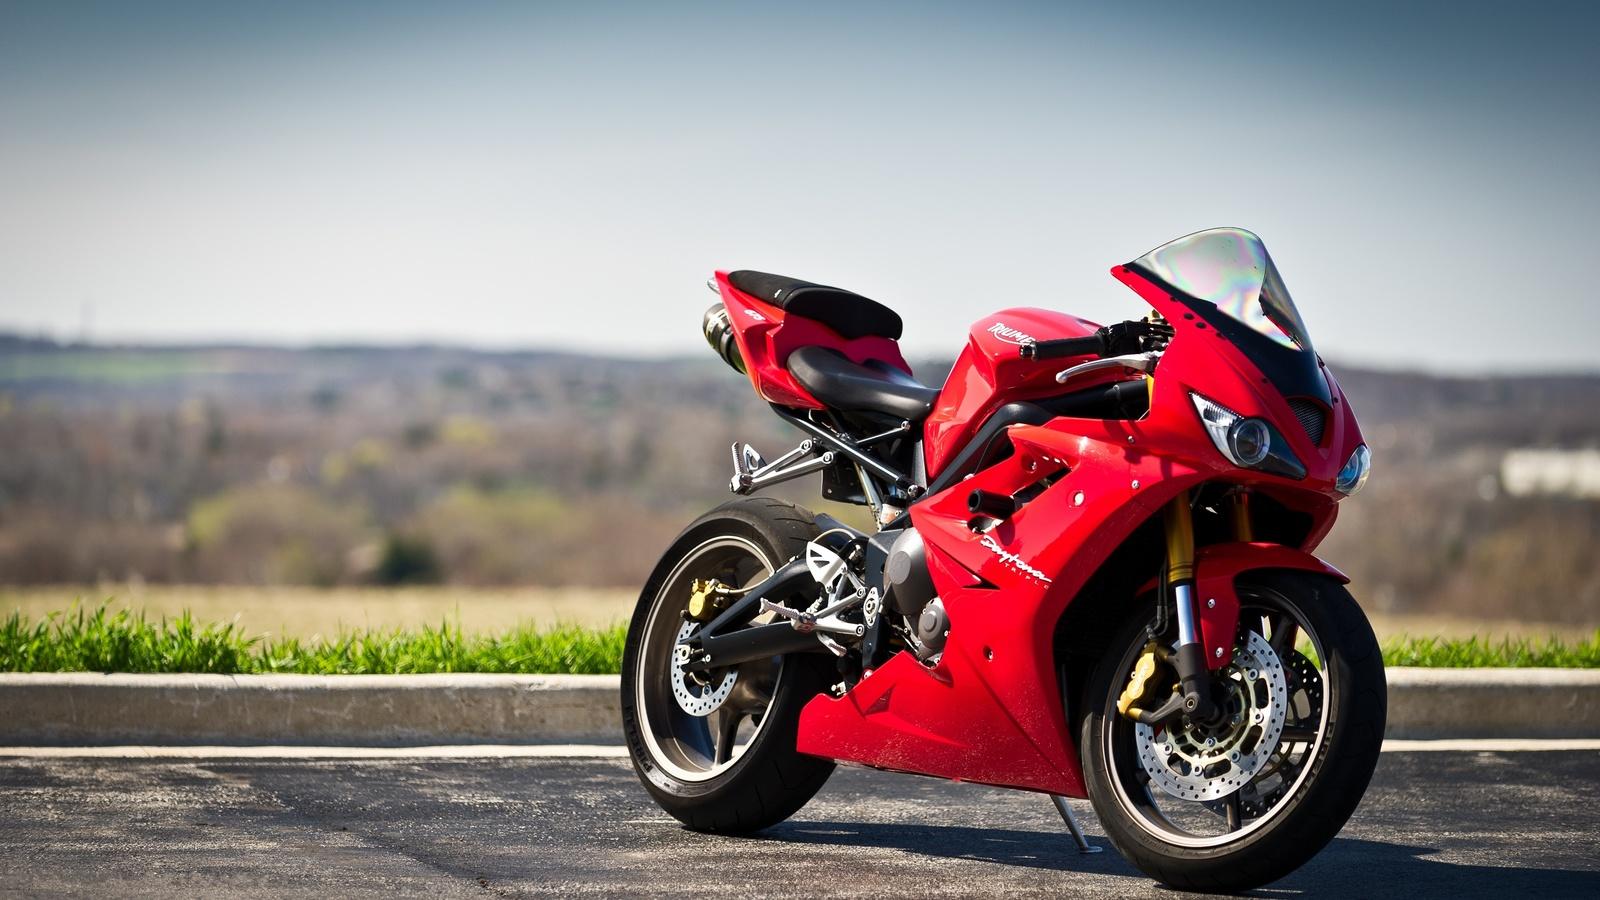 Картинка мотоциклы, картинки косплей прикольные